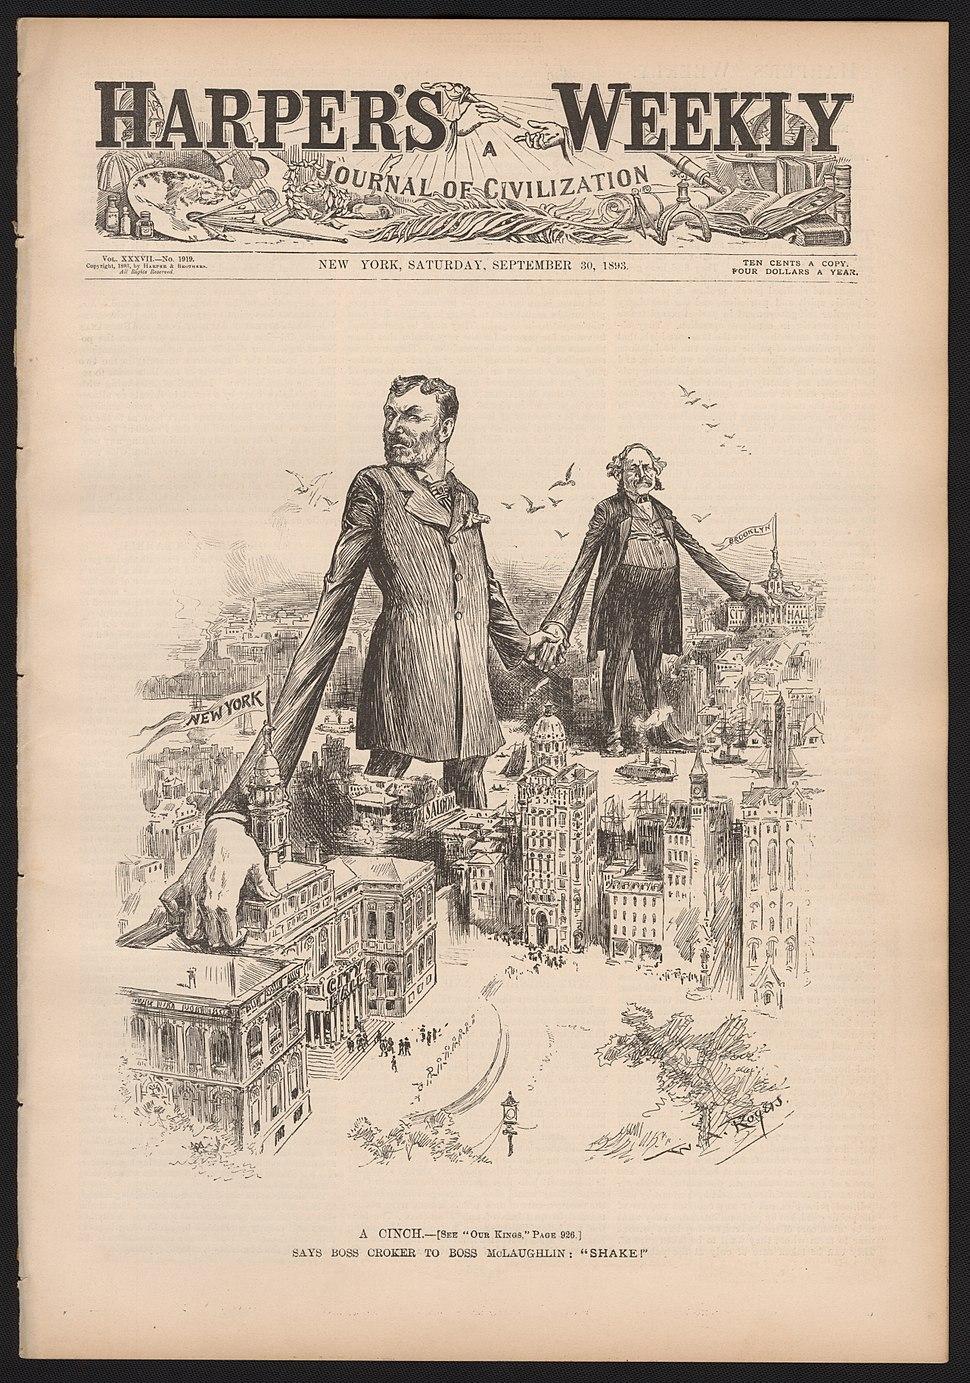 Rogers, W. A. (William Allen), Rogers A Cinch 1893 Cornell CUL PJM 1112 01